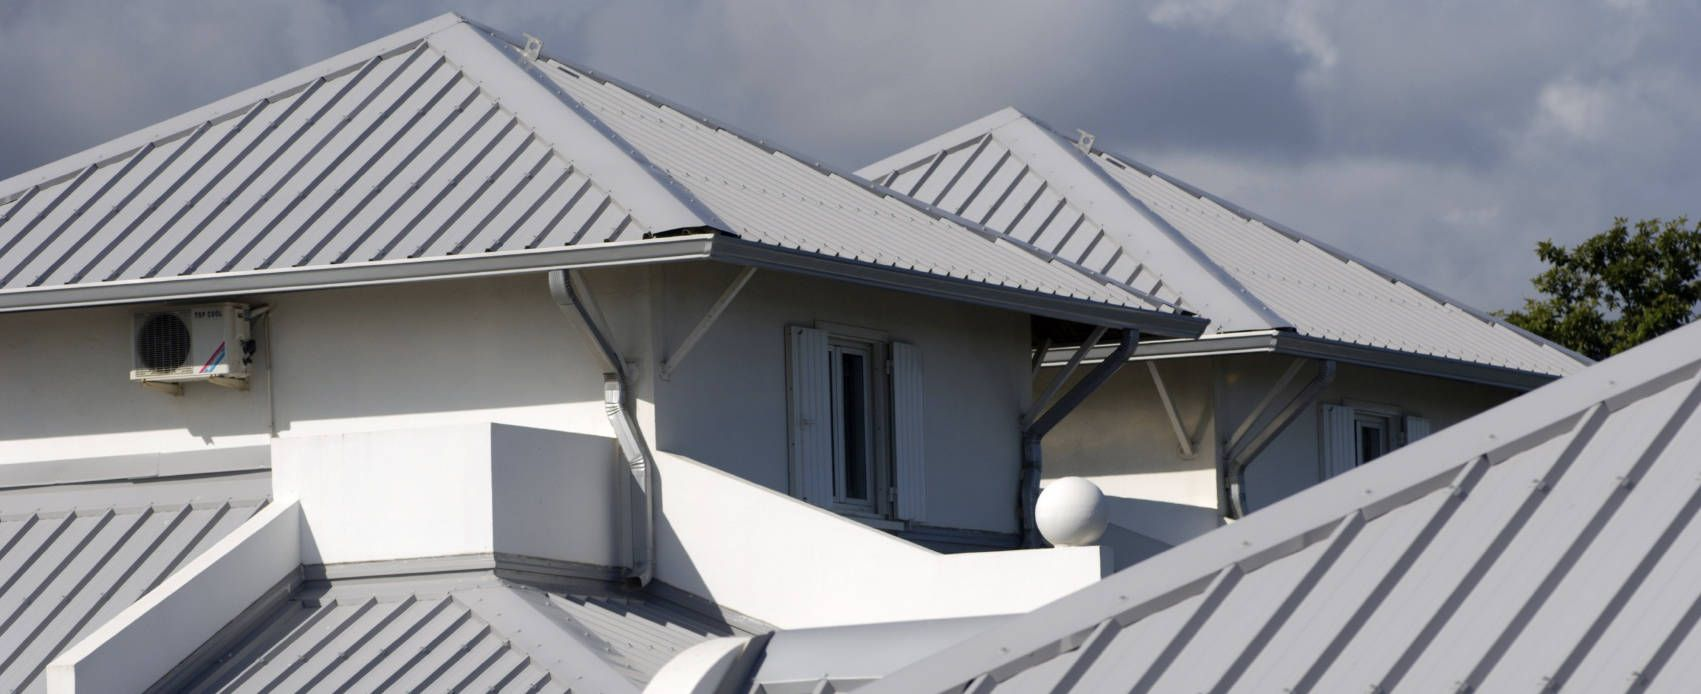 Metal Roofing El Paso Tx In 2020 Metal Roof Colors Roof Restoration Roof Design